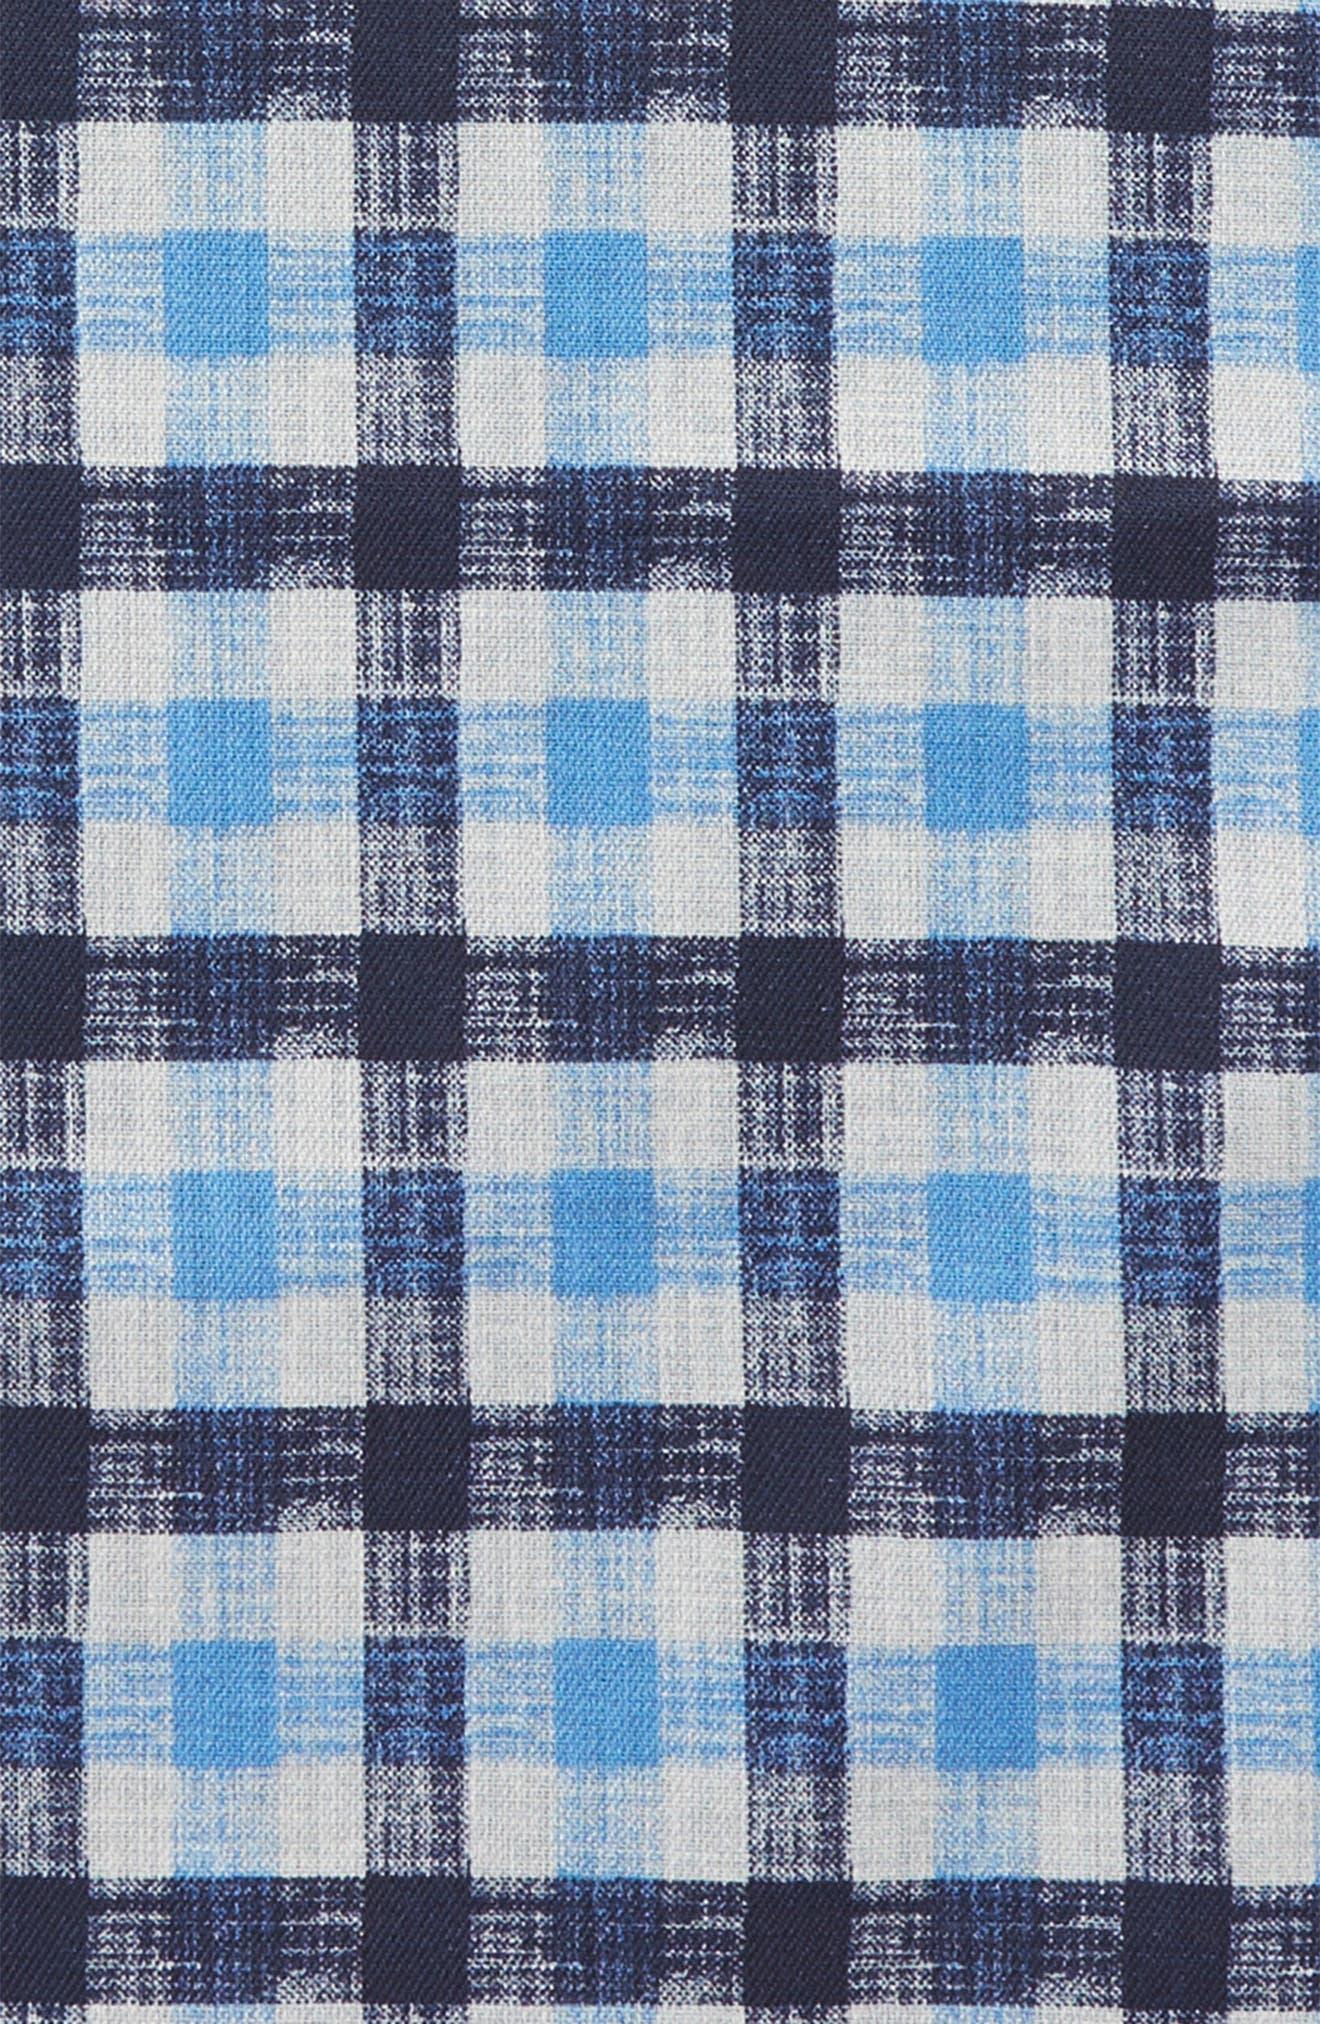 NORDSTROM MEN'S SHOP,                             Check Silk Pocket Square,                             Alternate thumbnail 3, color,                             400